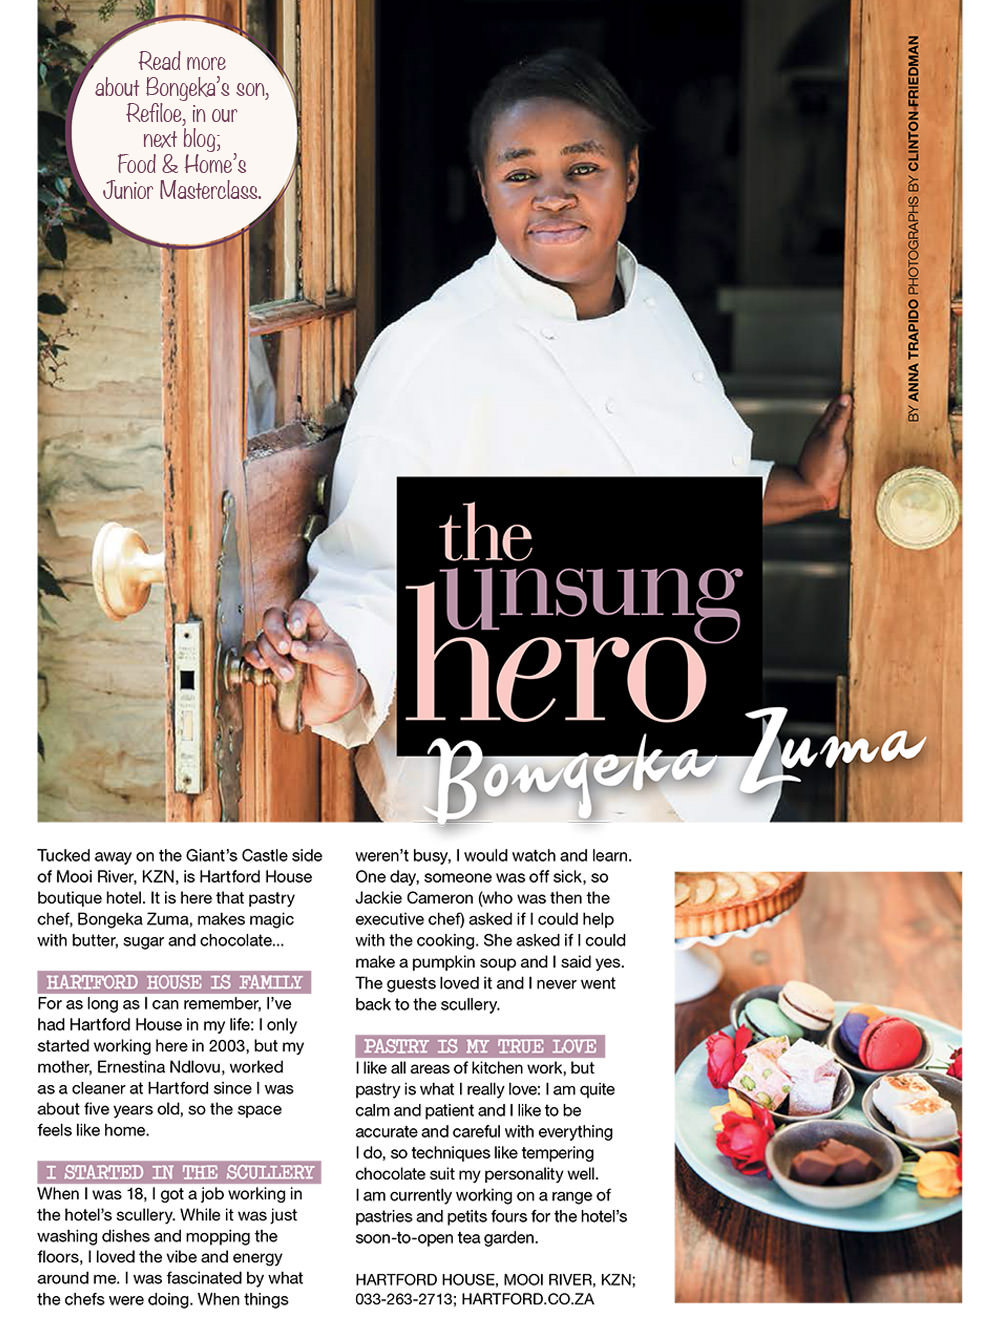 Chef Bongeka Zuma